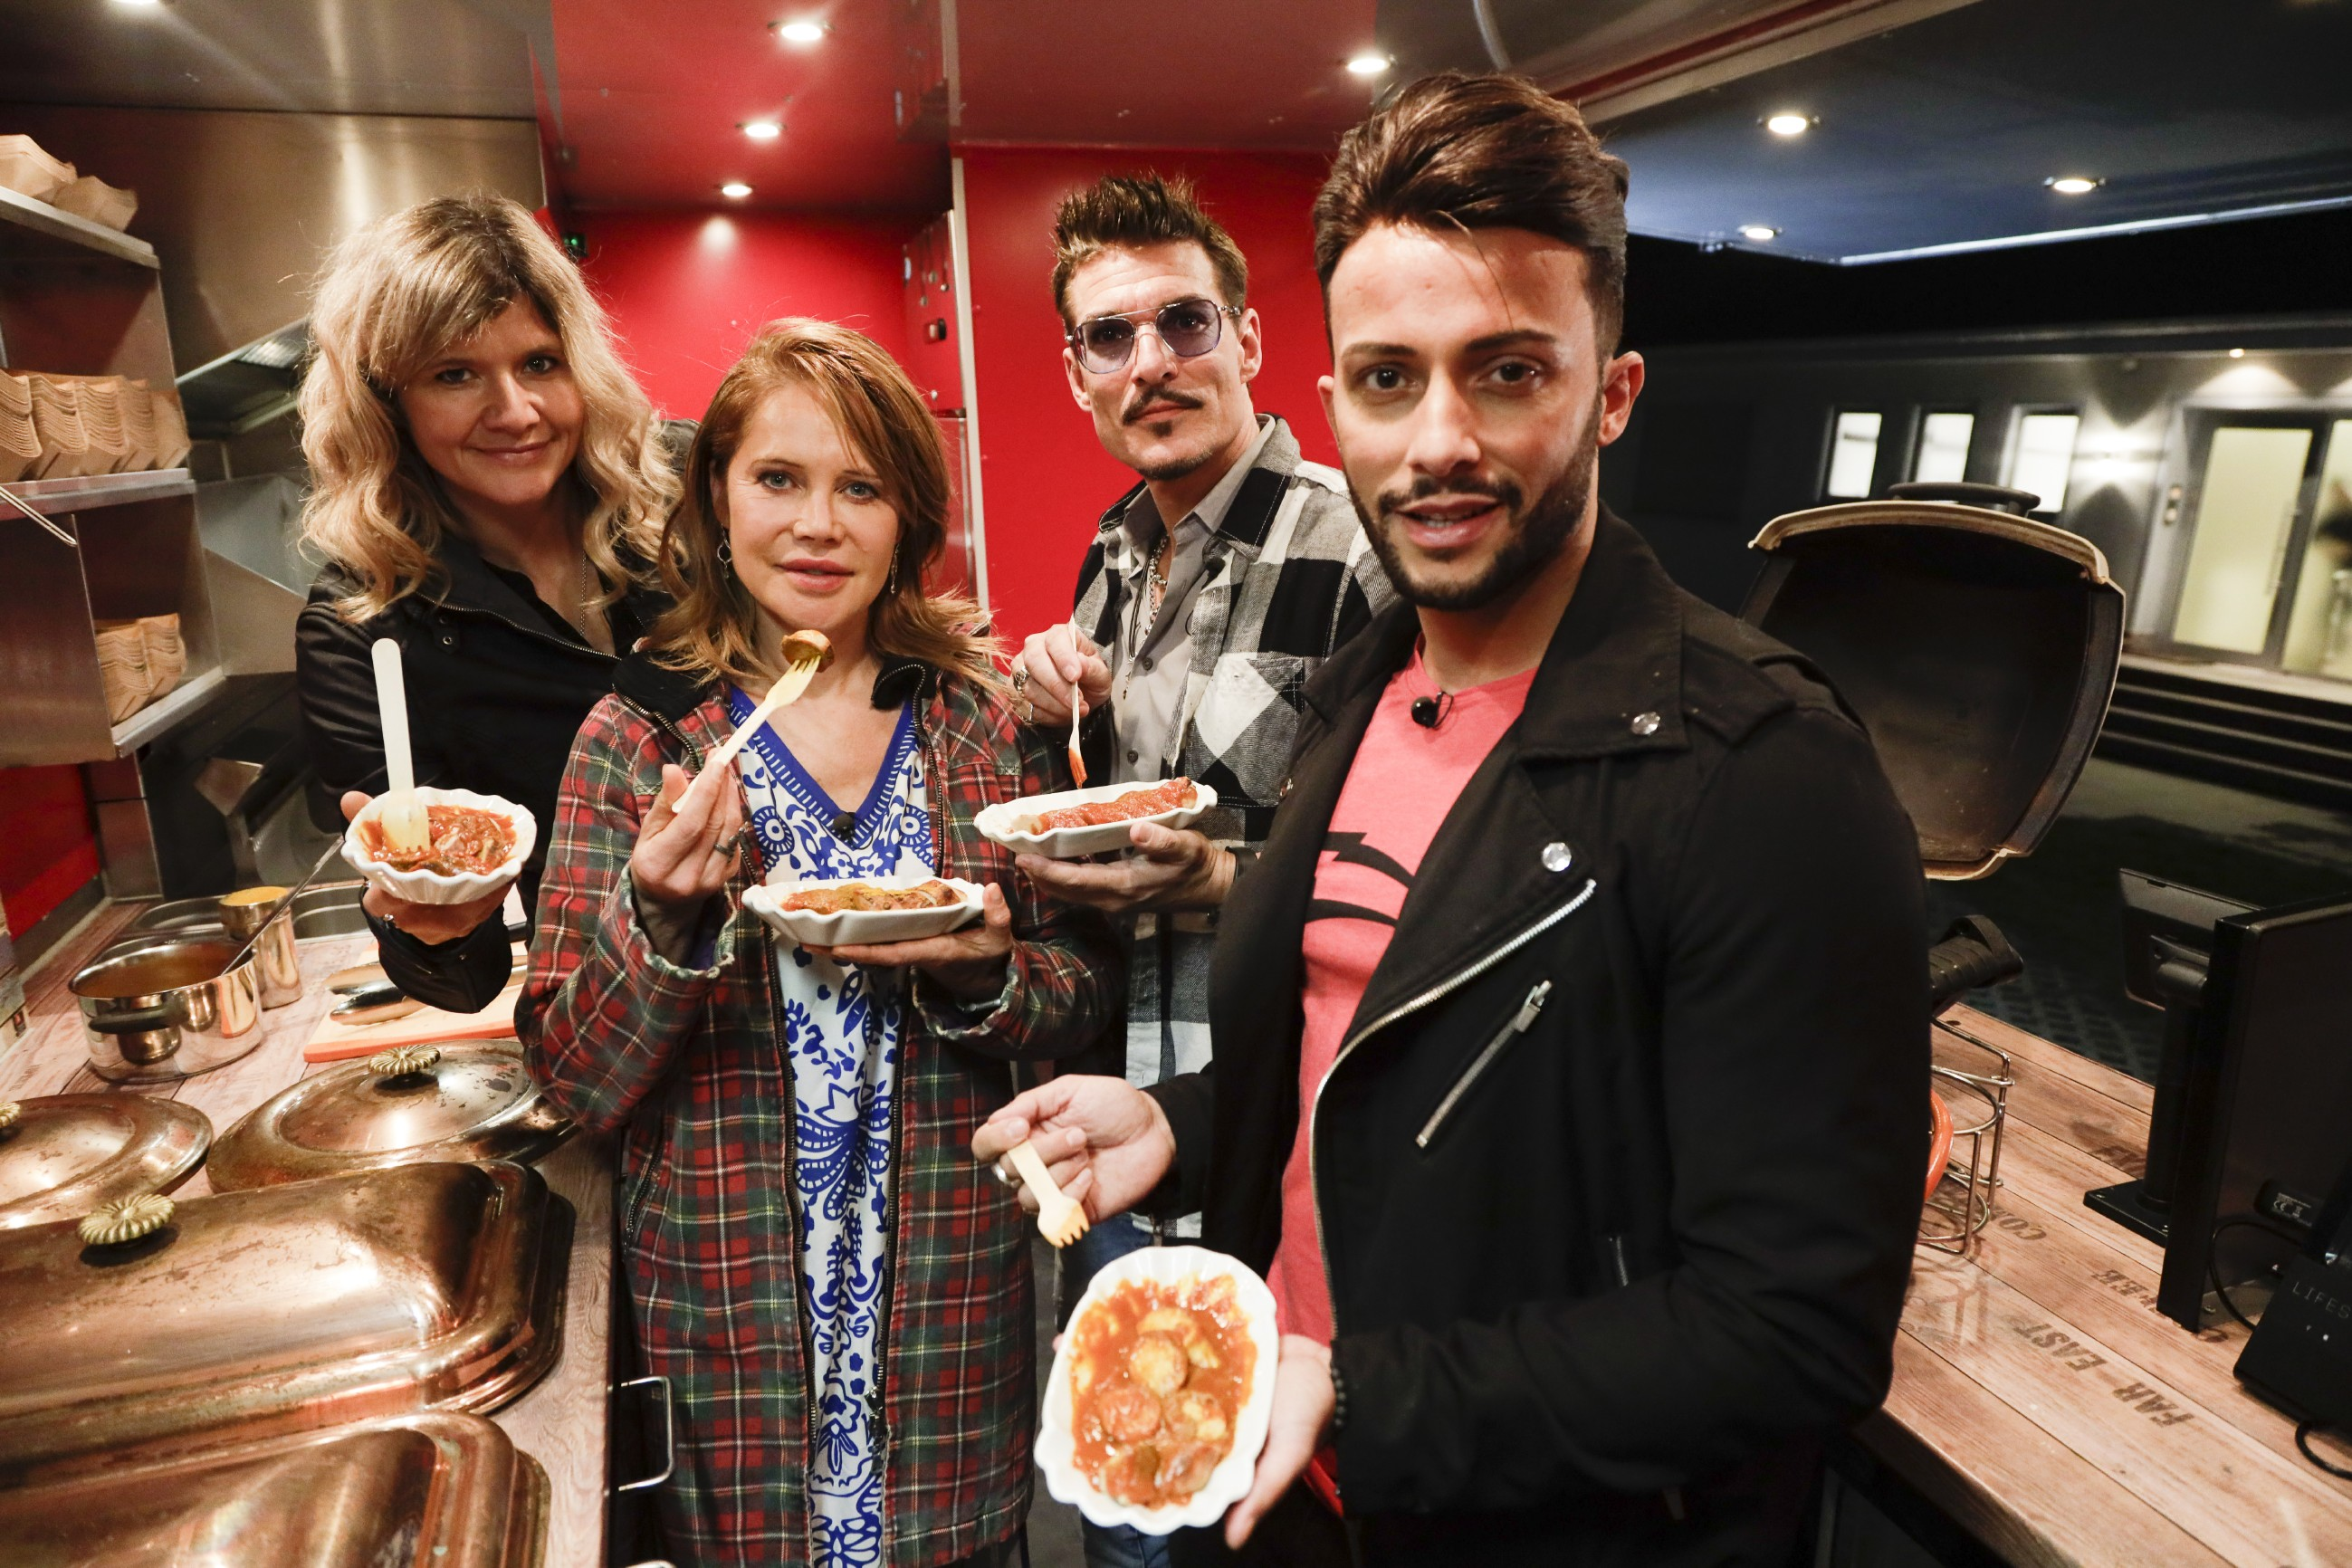 promi dinner dschungel 2019